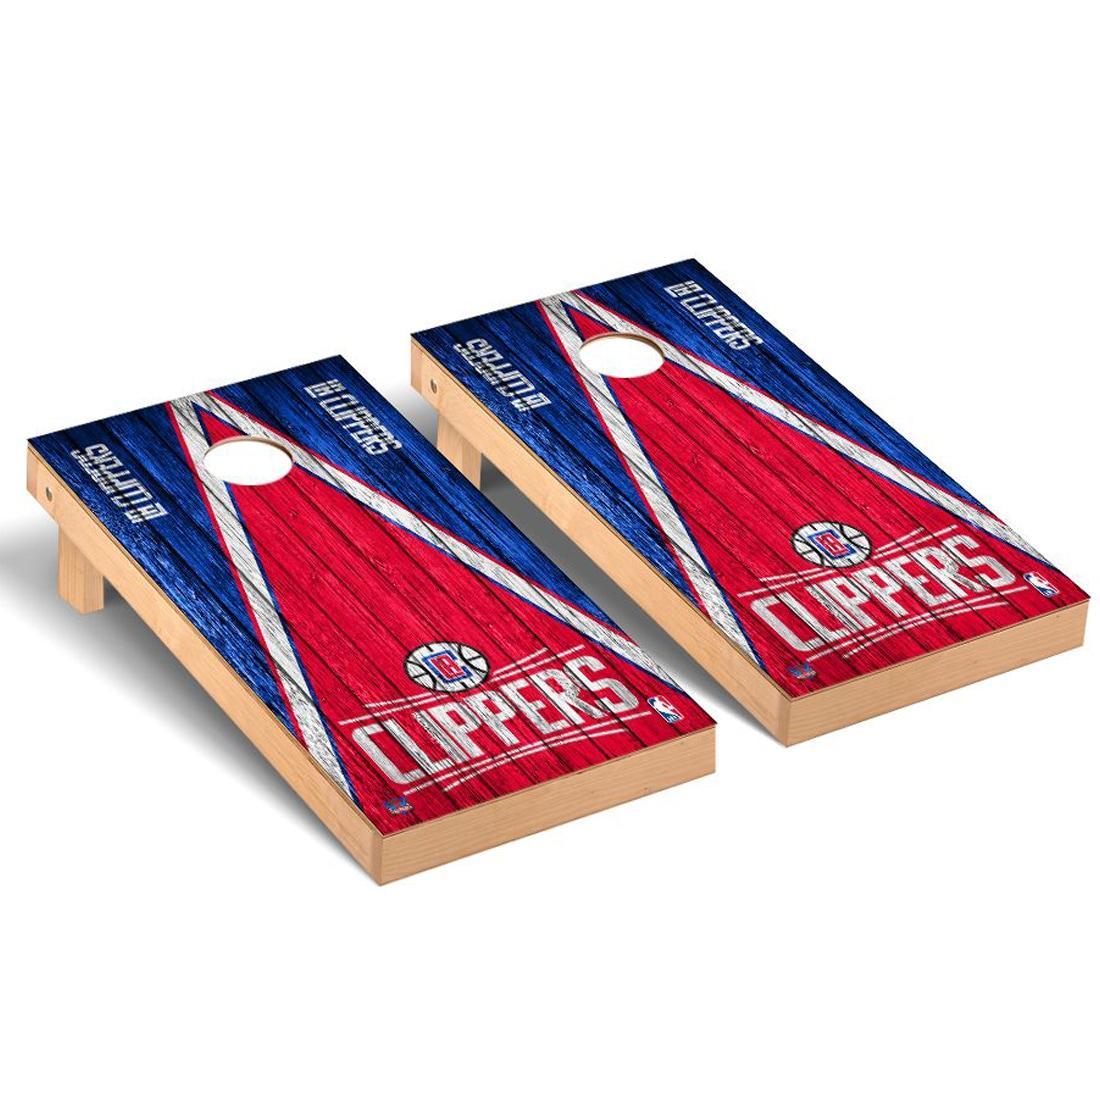 LA Clippers 2' x 4' Weathered Cornhole Game Set